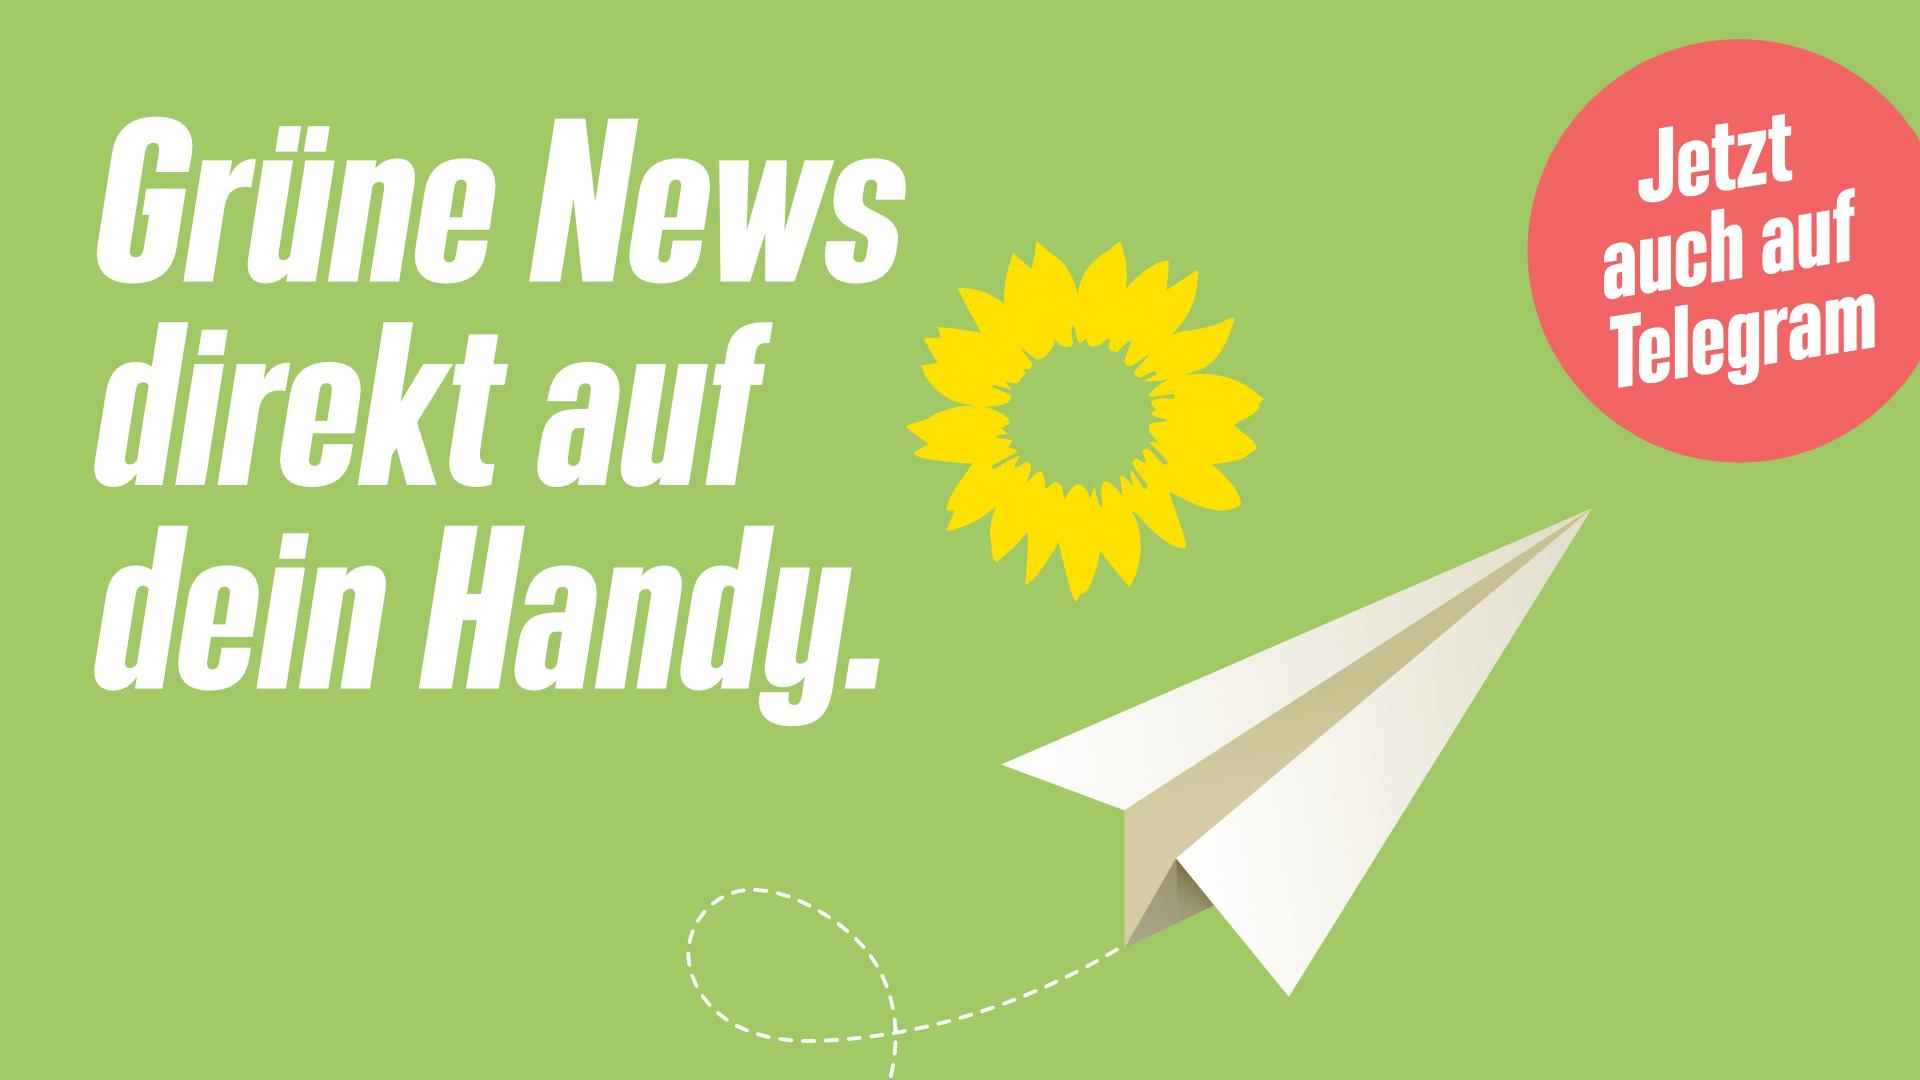 Grüne News jetzt auch via Telegram